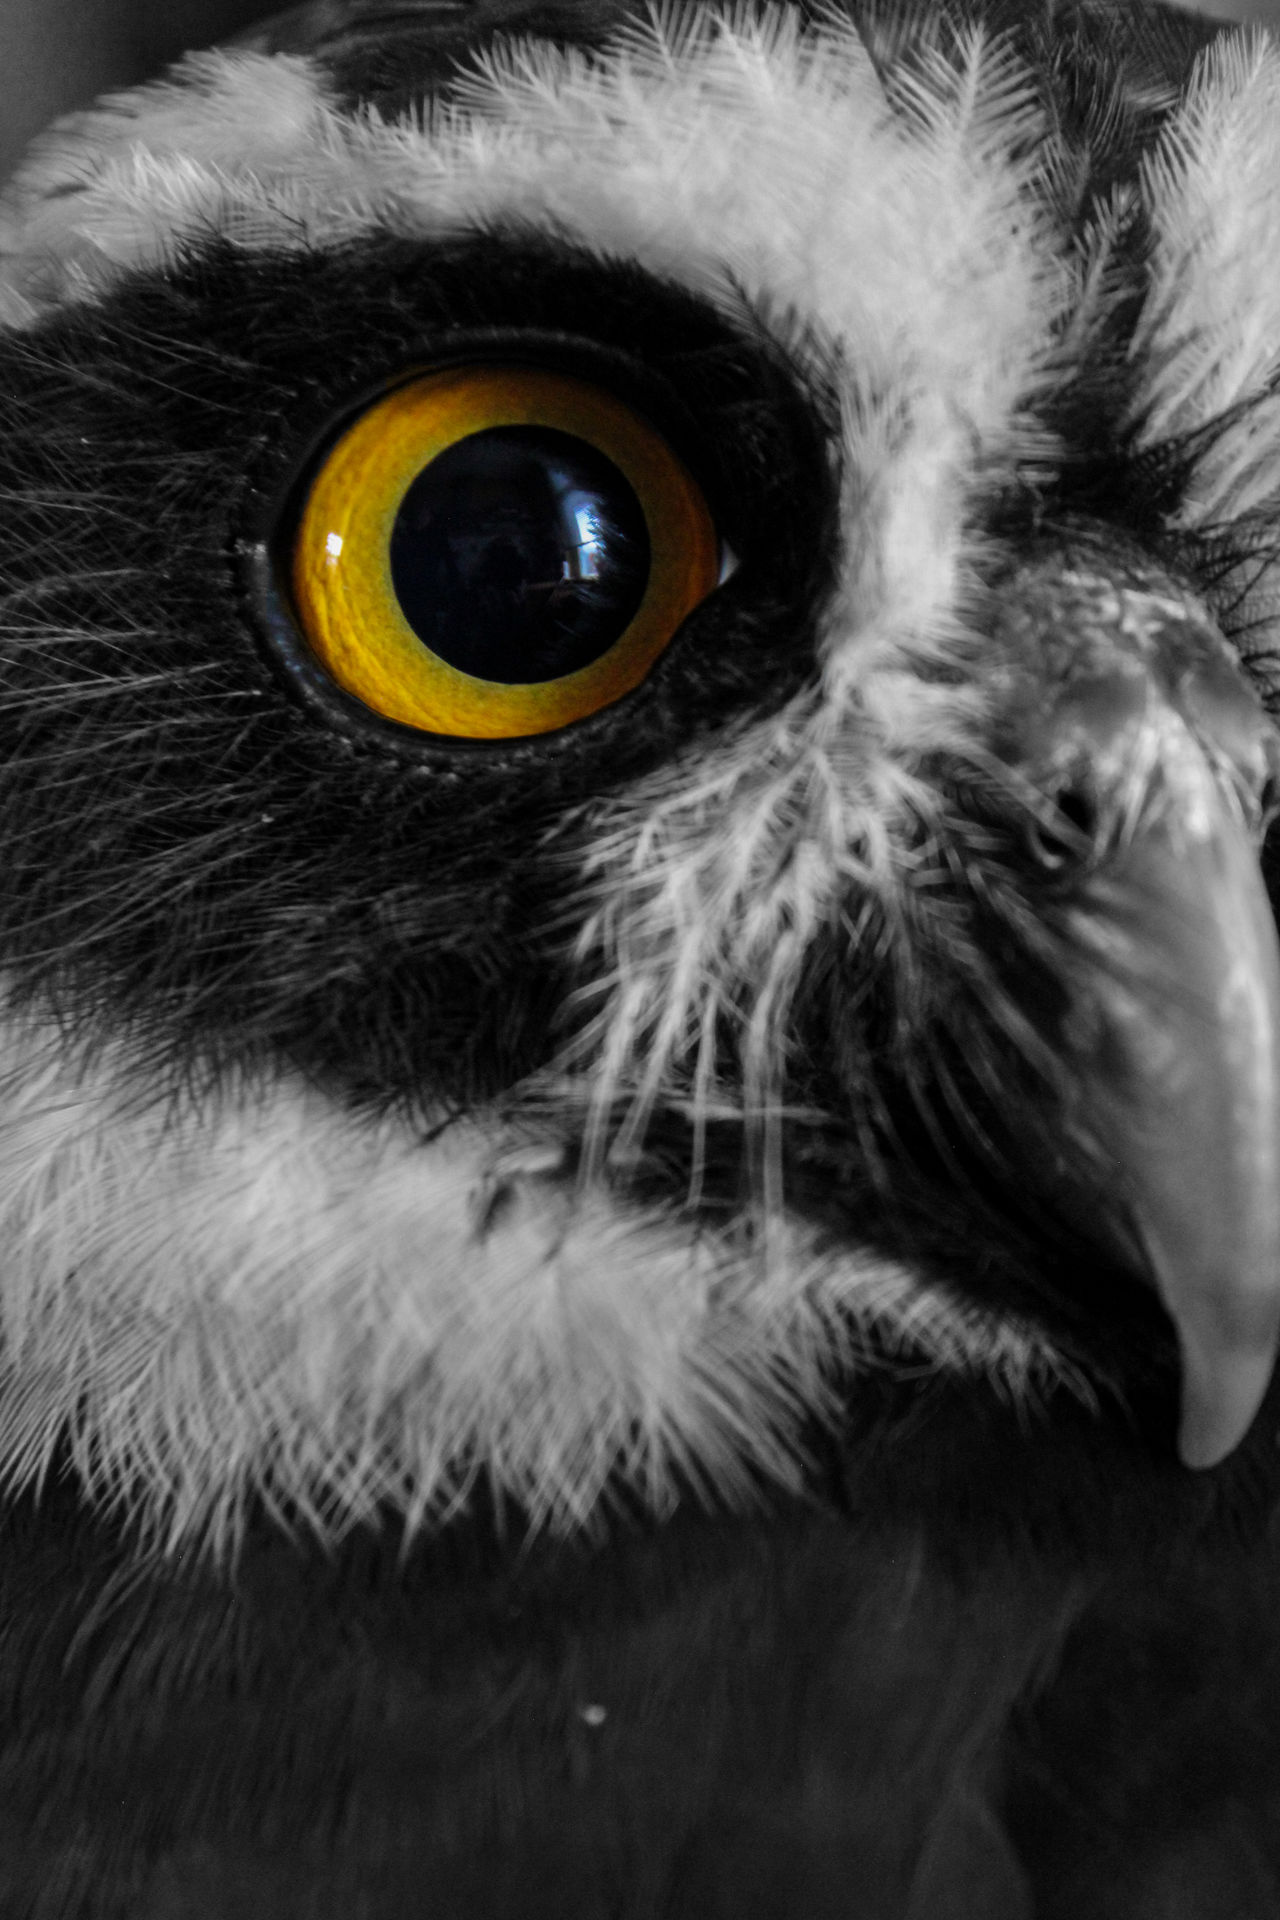 Animal Body Part Animal Eye Animal Themes Beak Bird Close-up Cute737 Day Eyeball Human Eye Indoors  Isolated Color Looking At Camera Mammal Mask - Disguise One Animal Owl Owl Eyes Portrait Spooky Yellow Eyes